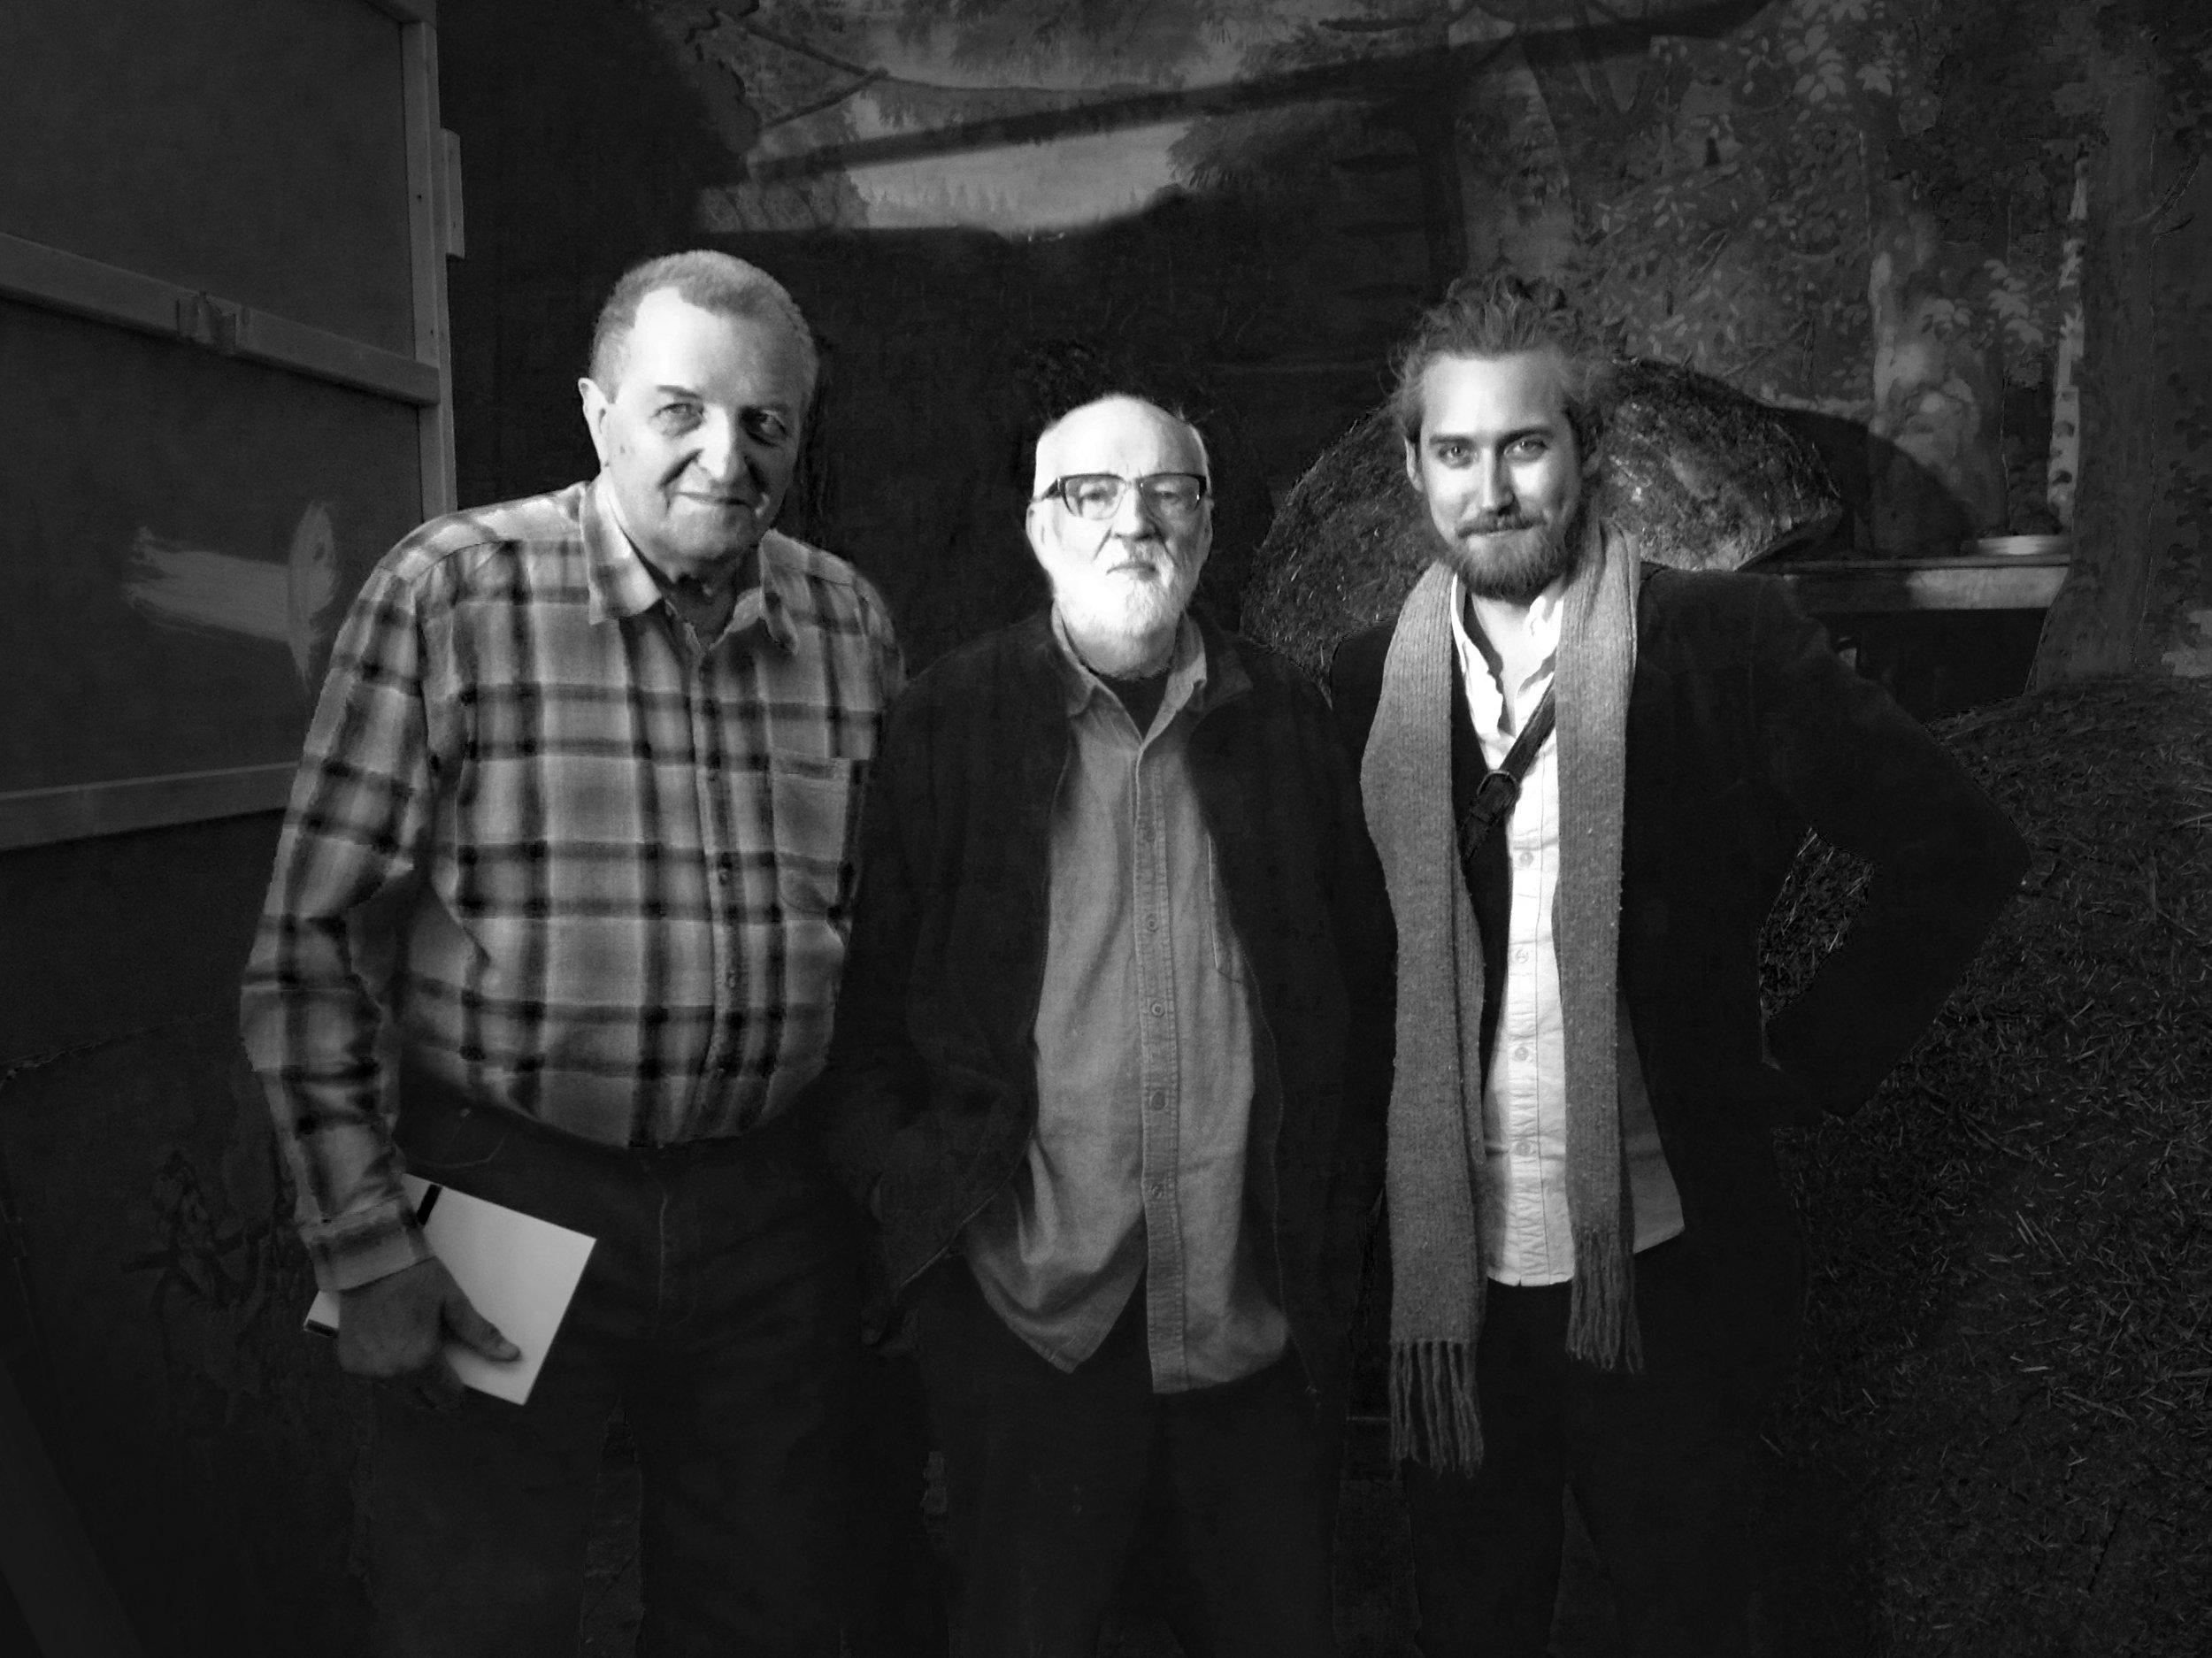 Jaromír Kallista, Jan Švankmajer, Joseph Wallace, Czech Republic, May 2017